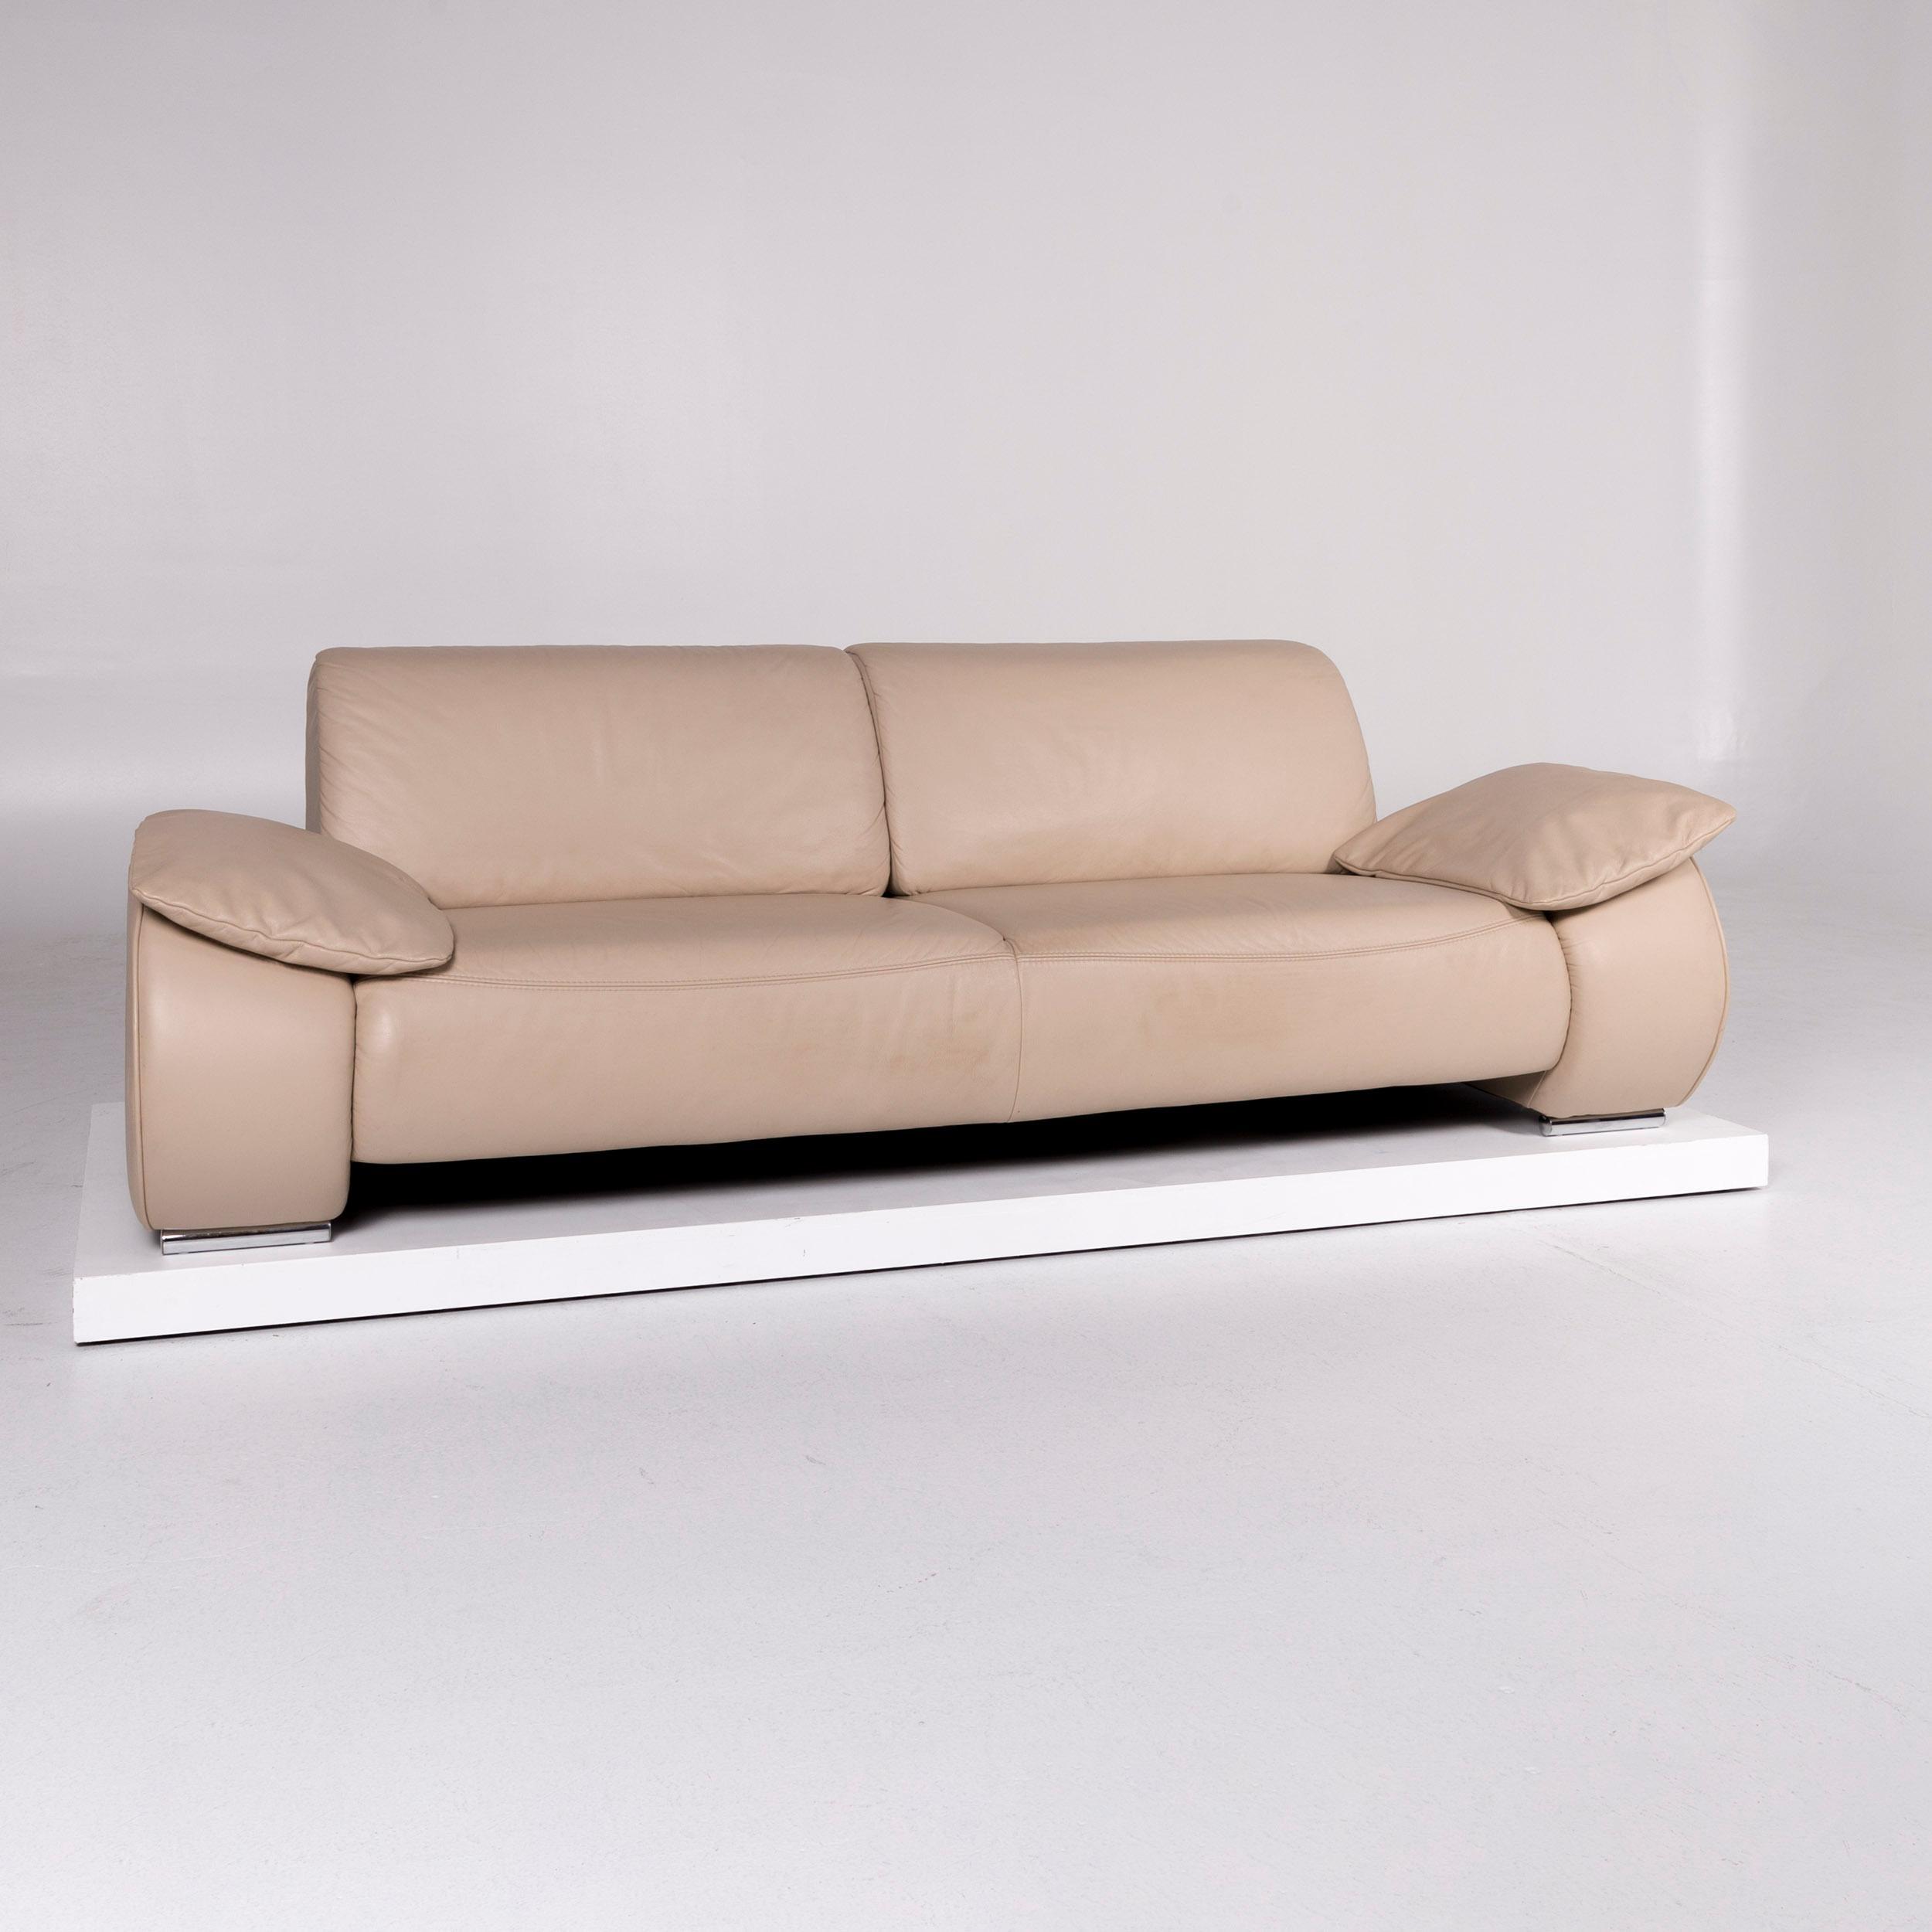 Musterring Designer Leder Sofa Beige Dreisitzer